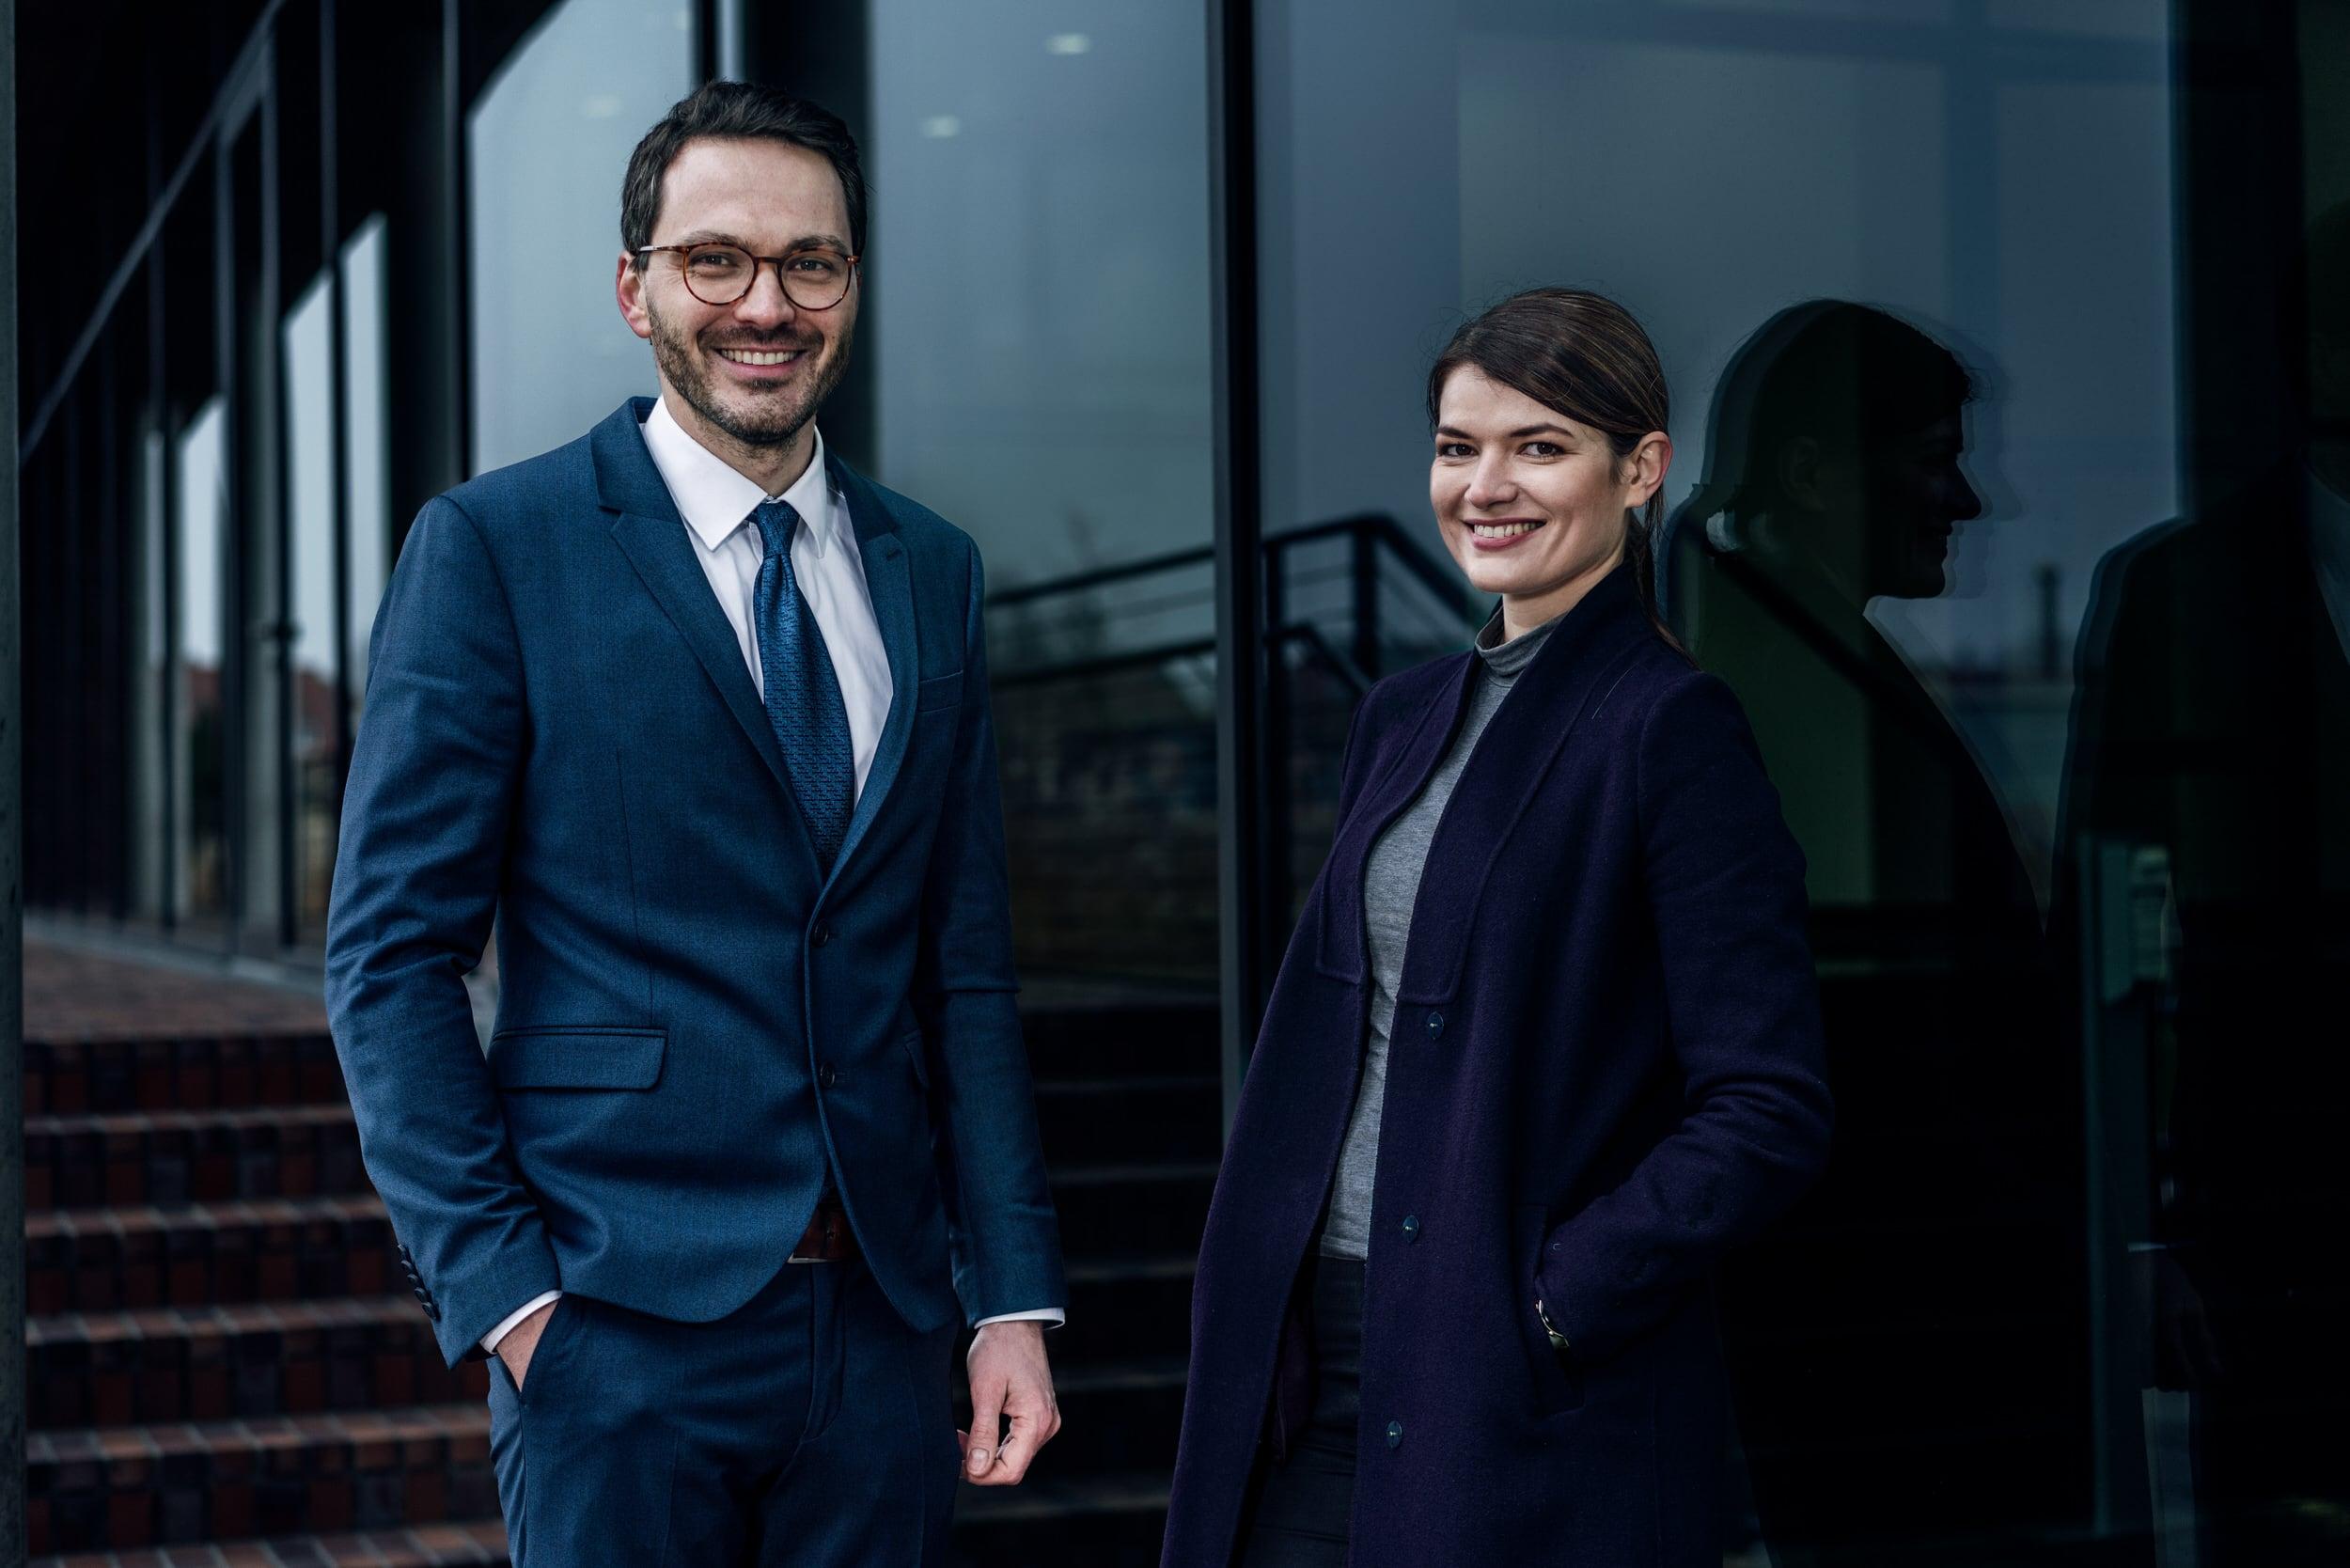 Phenix-Gründer Benedikt Stefan lächelnd